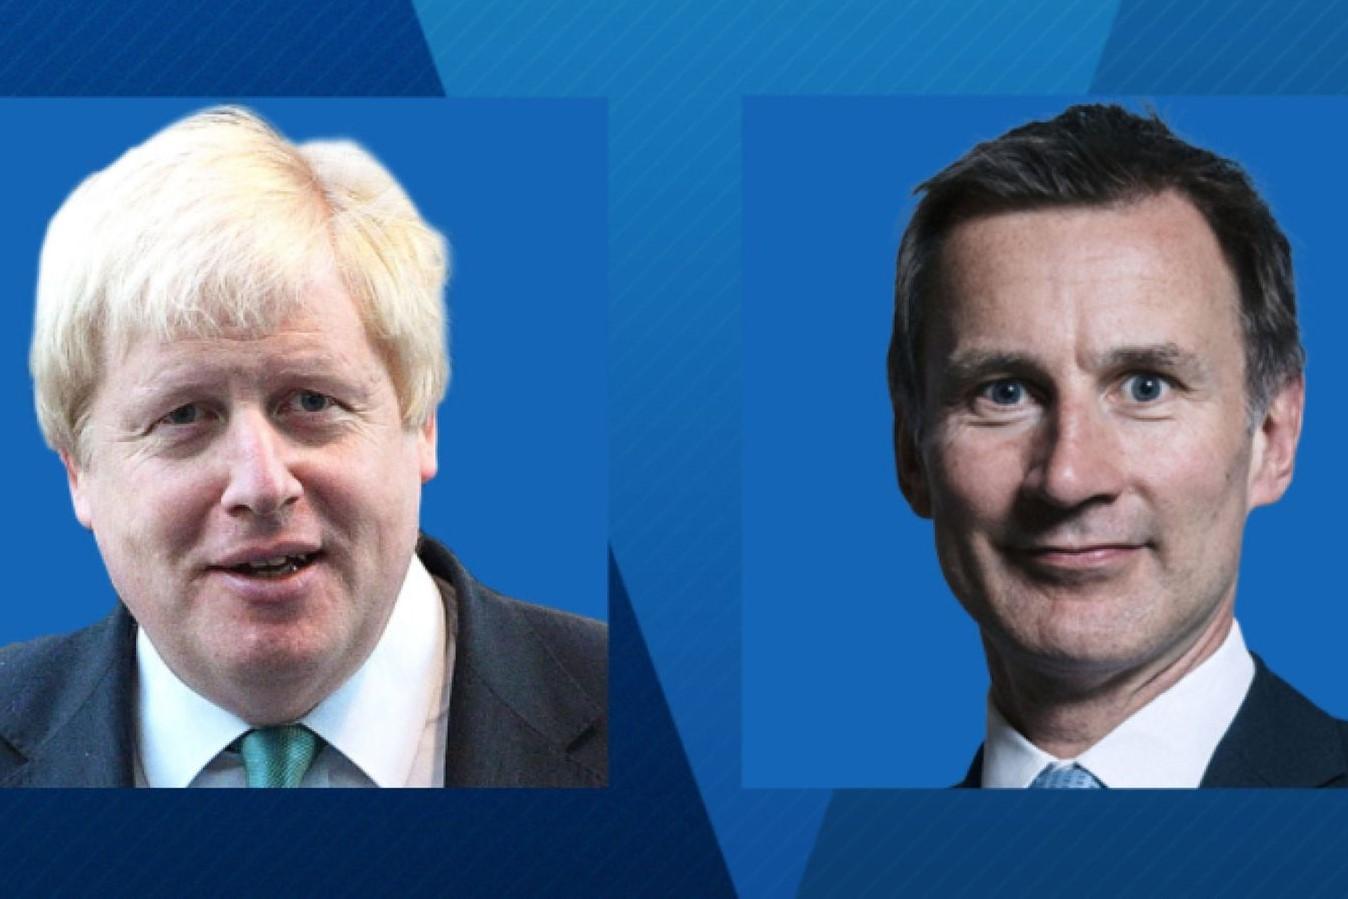 Will Boris Johnson become UK's next prime minister?